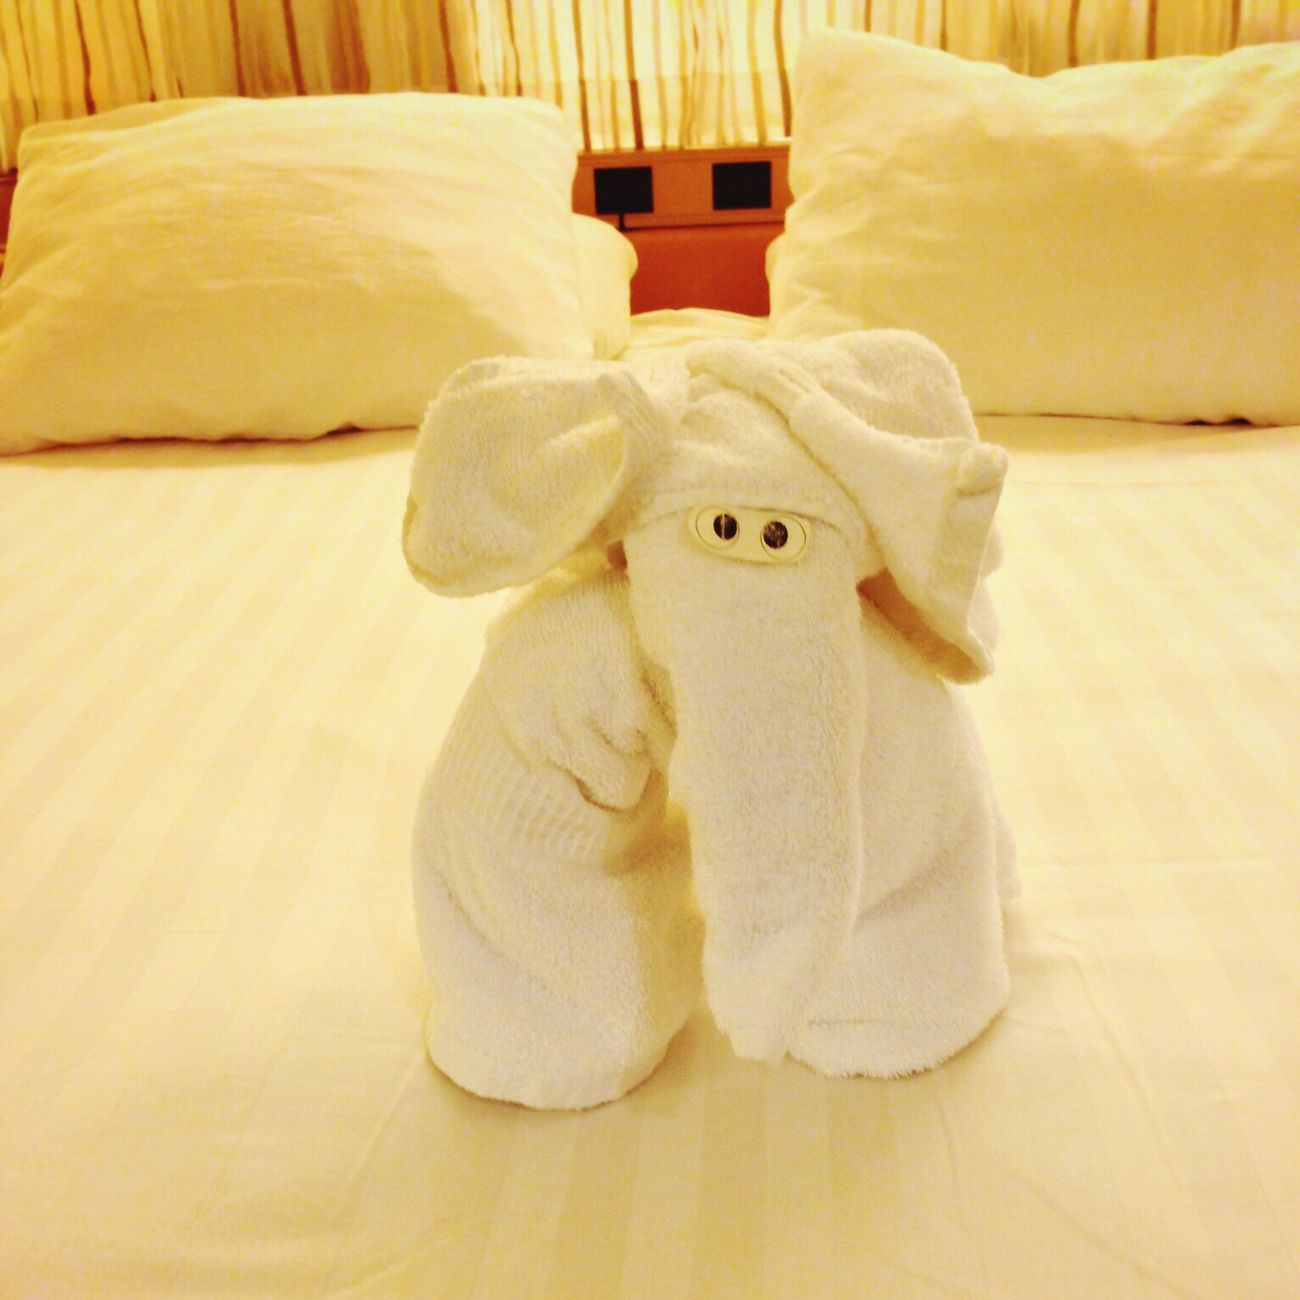 Cruise 2013 Animal Representation Koduckgirl Holland American Lines Towel Animal